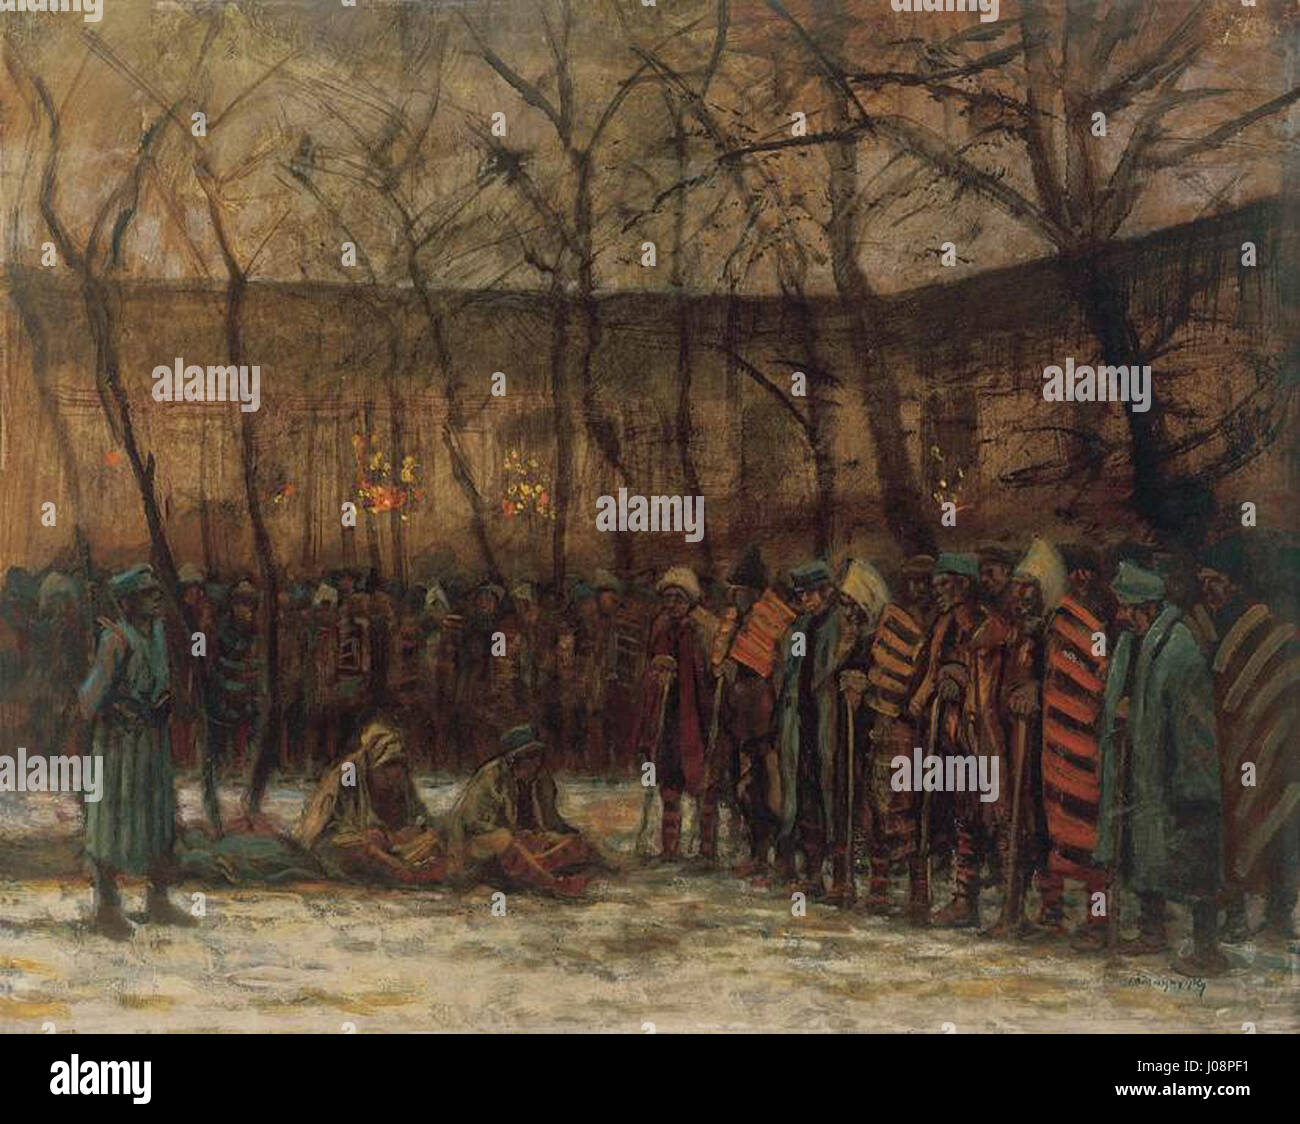 Christmas 1914.Mednyanszky Laszlo Soldiers Christmas 1914 8 Stock